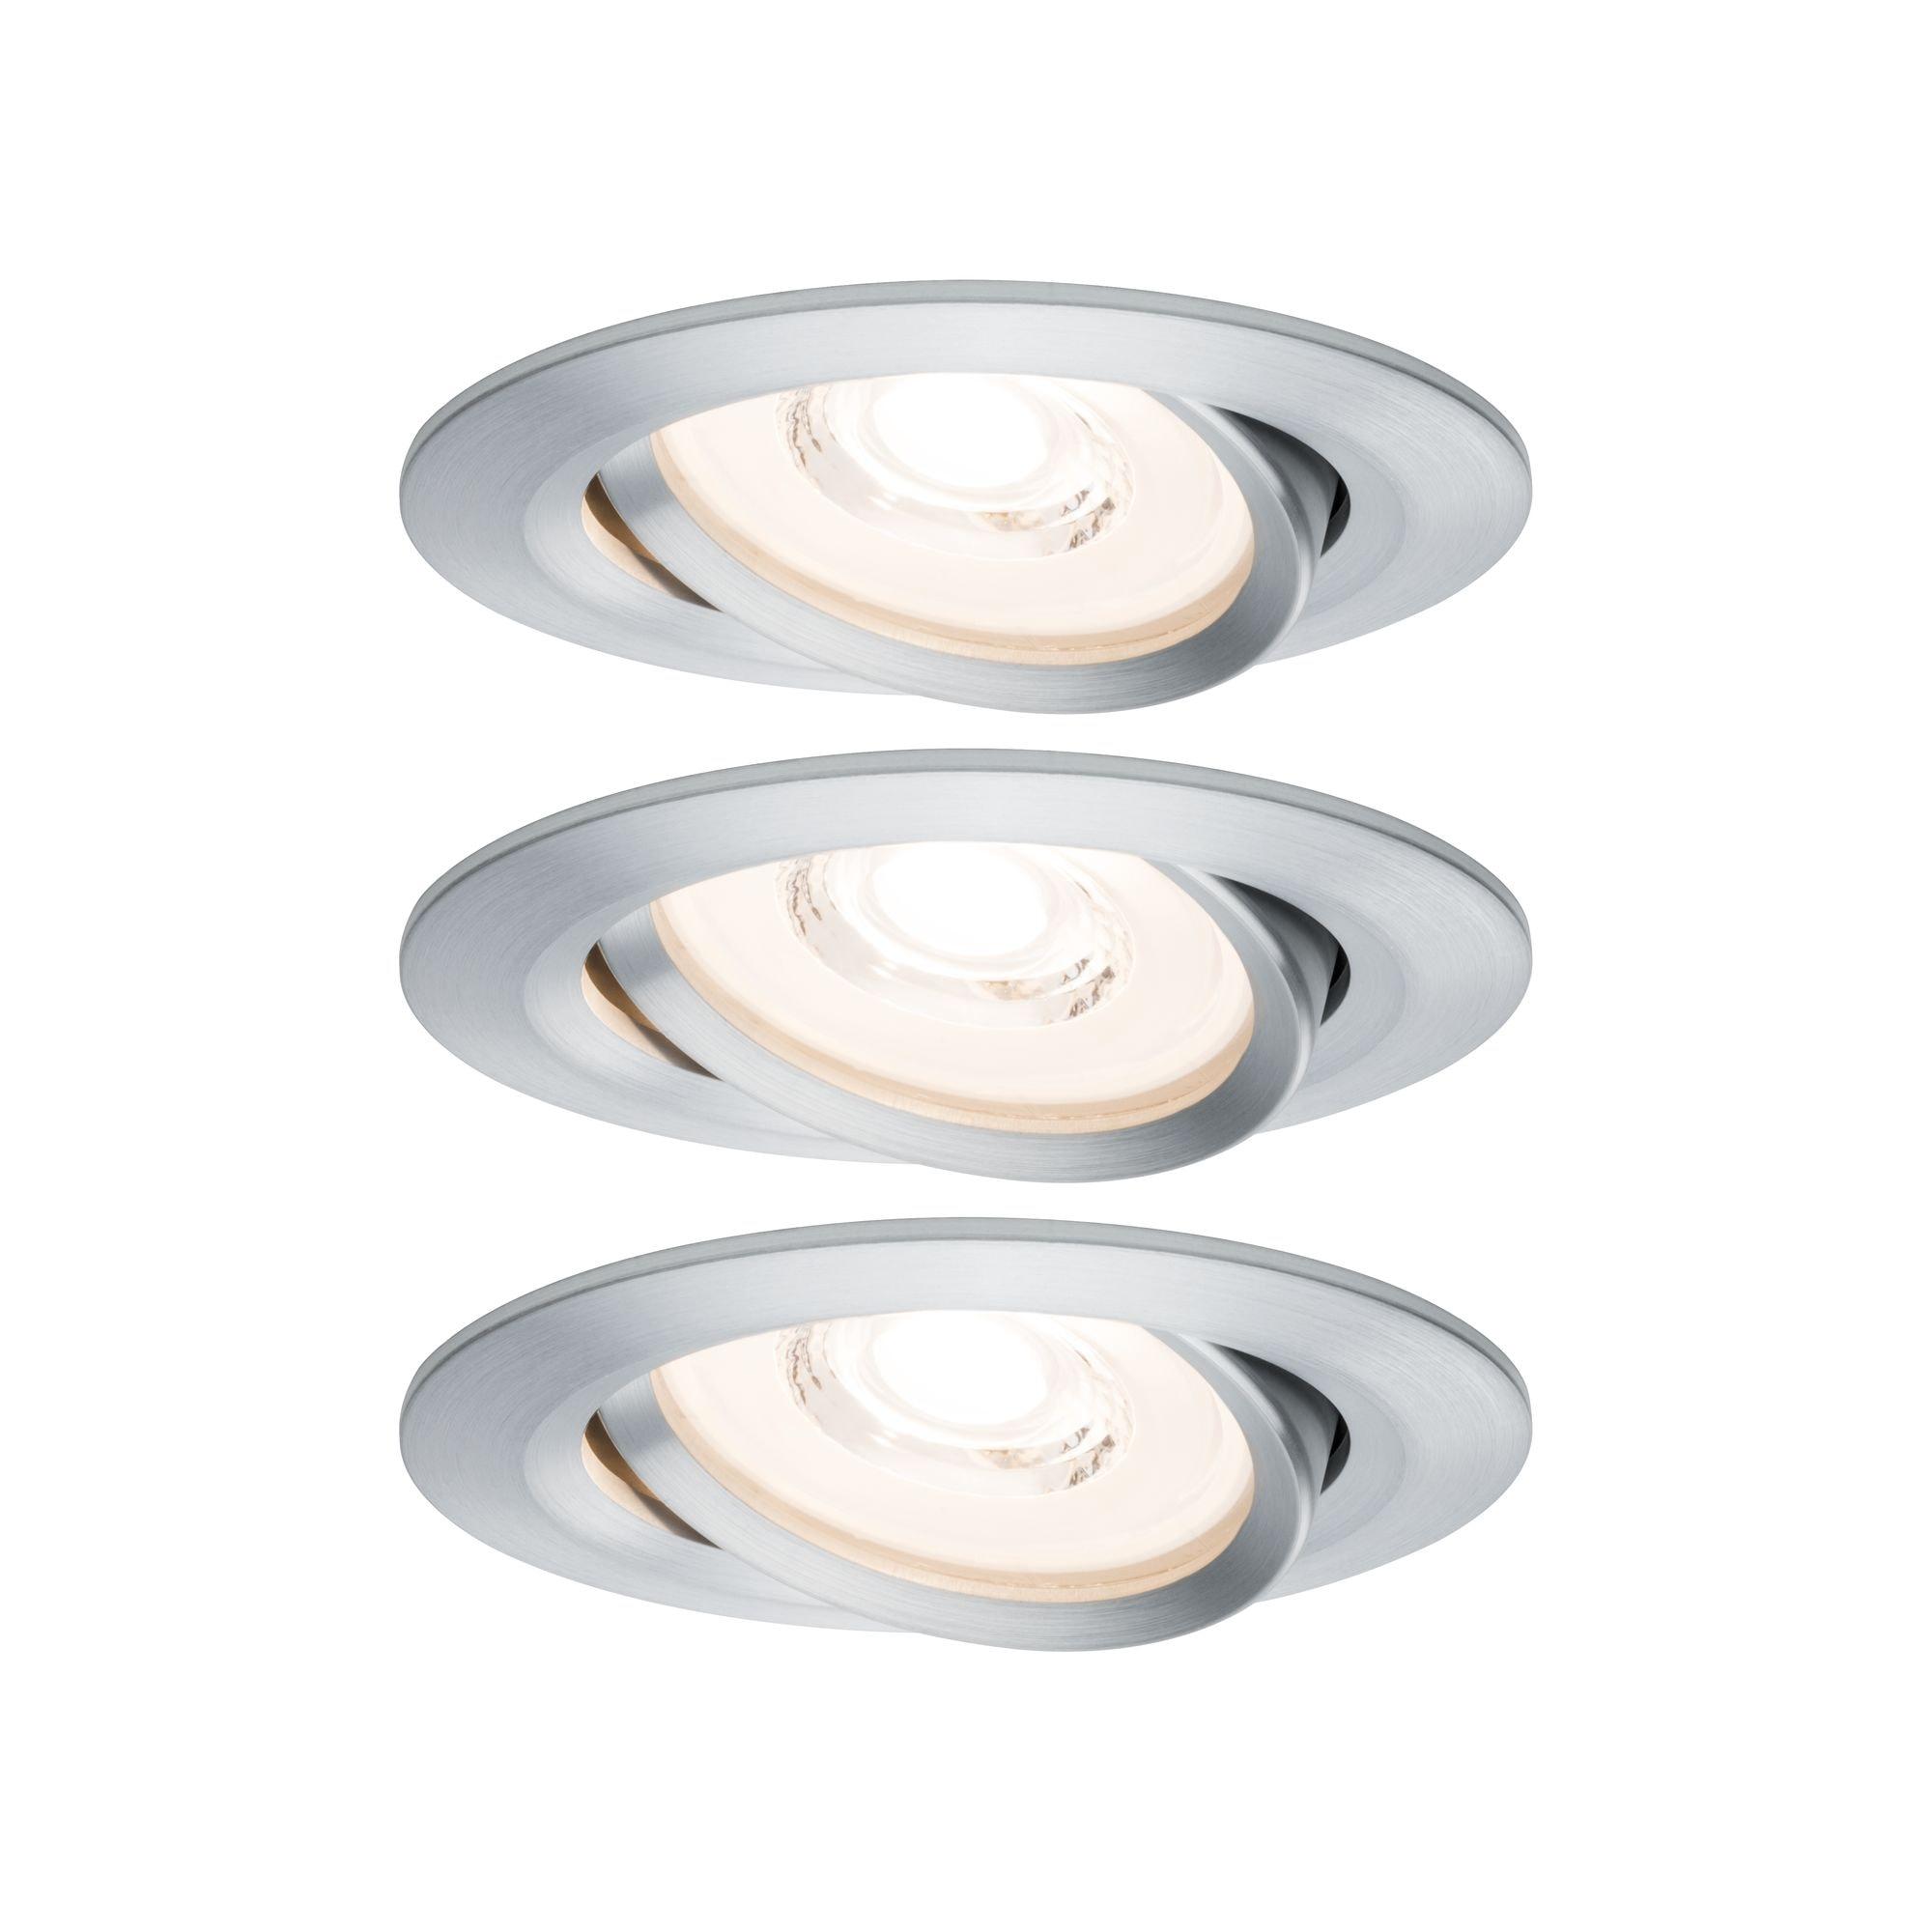 Paulmann LED Einbaustrahler dimmbar IP23 Alu 6,8W Reflector Coin schwenkbar Reflector Coin schwenkbar, 3 St., Warmweiß